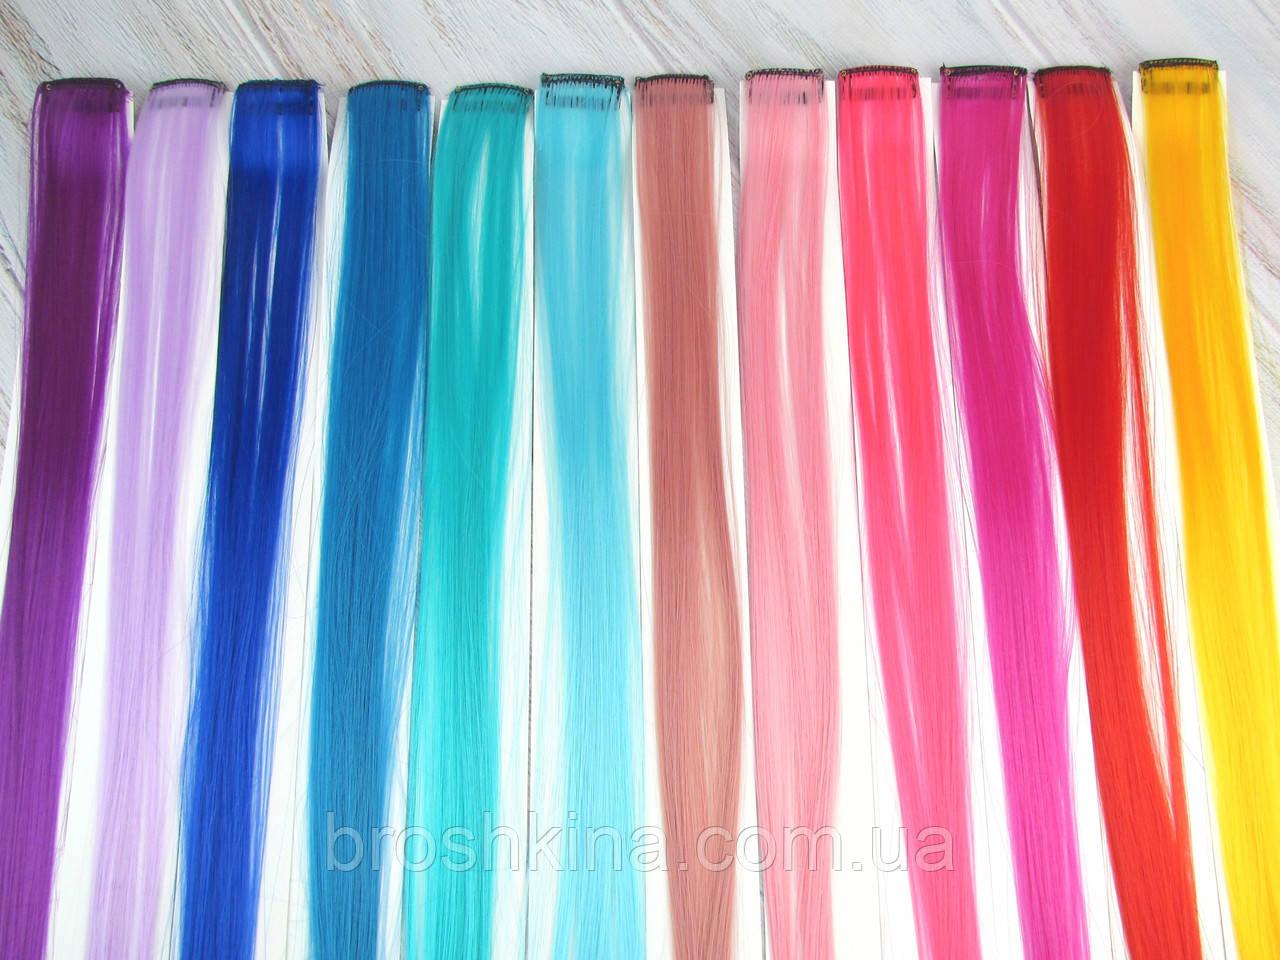 Цветные пряди на заколках клипсах набор 12 штук